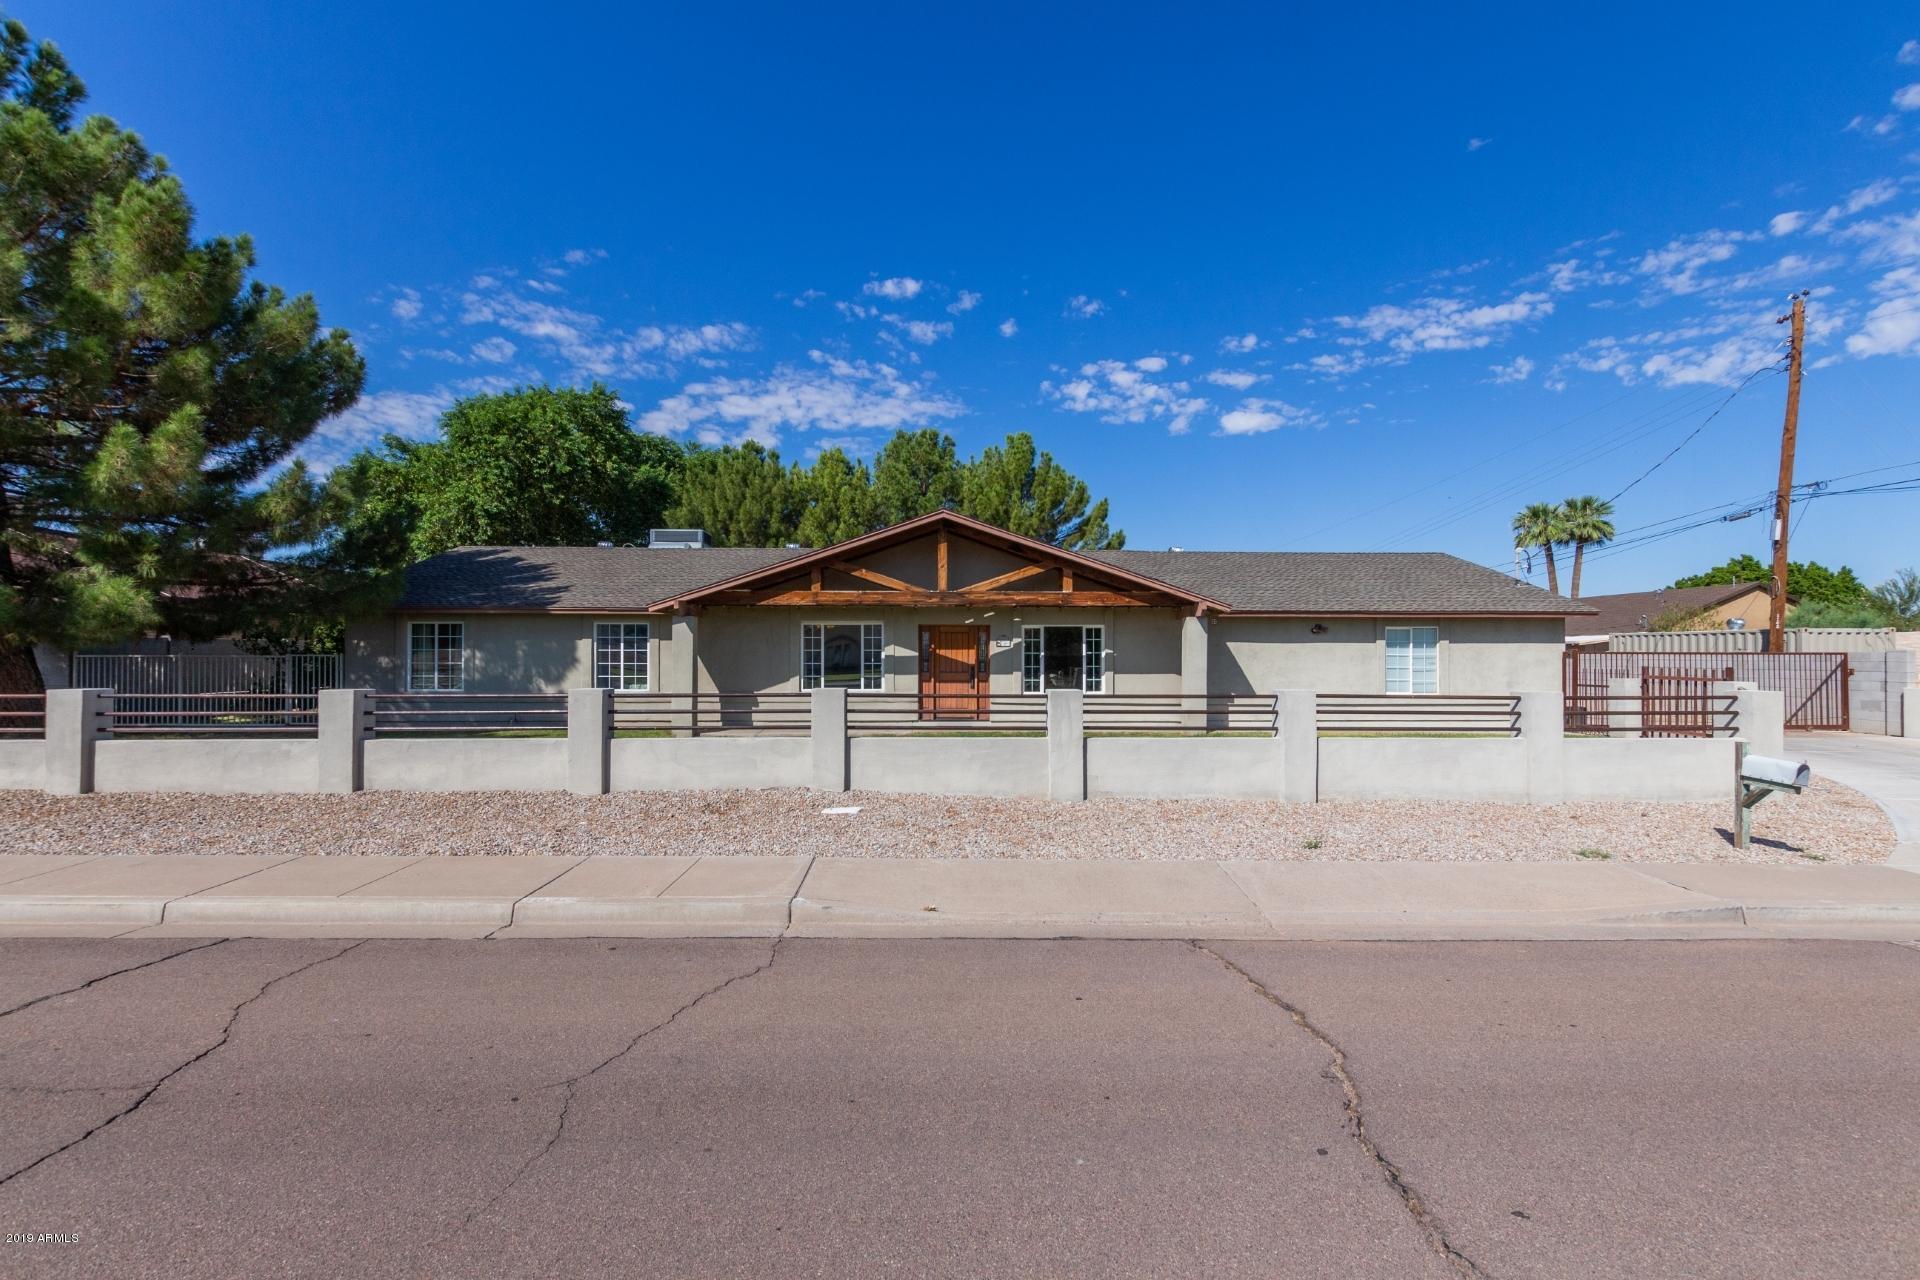 Photo of 8002 S 12TH Street, Phoenix, AZ 85042